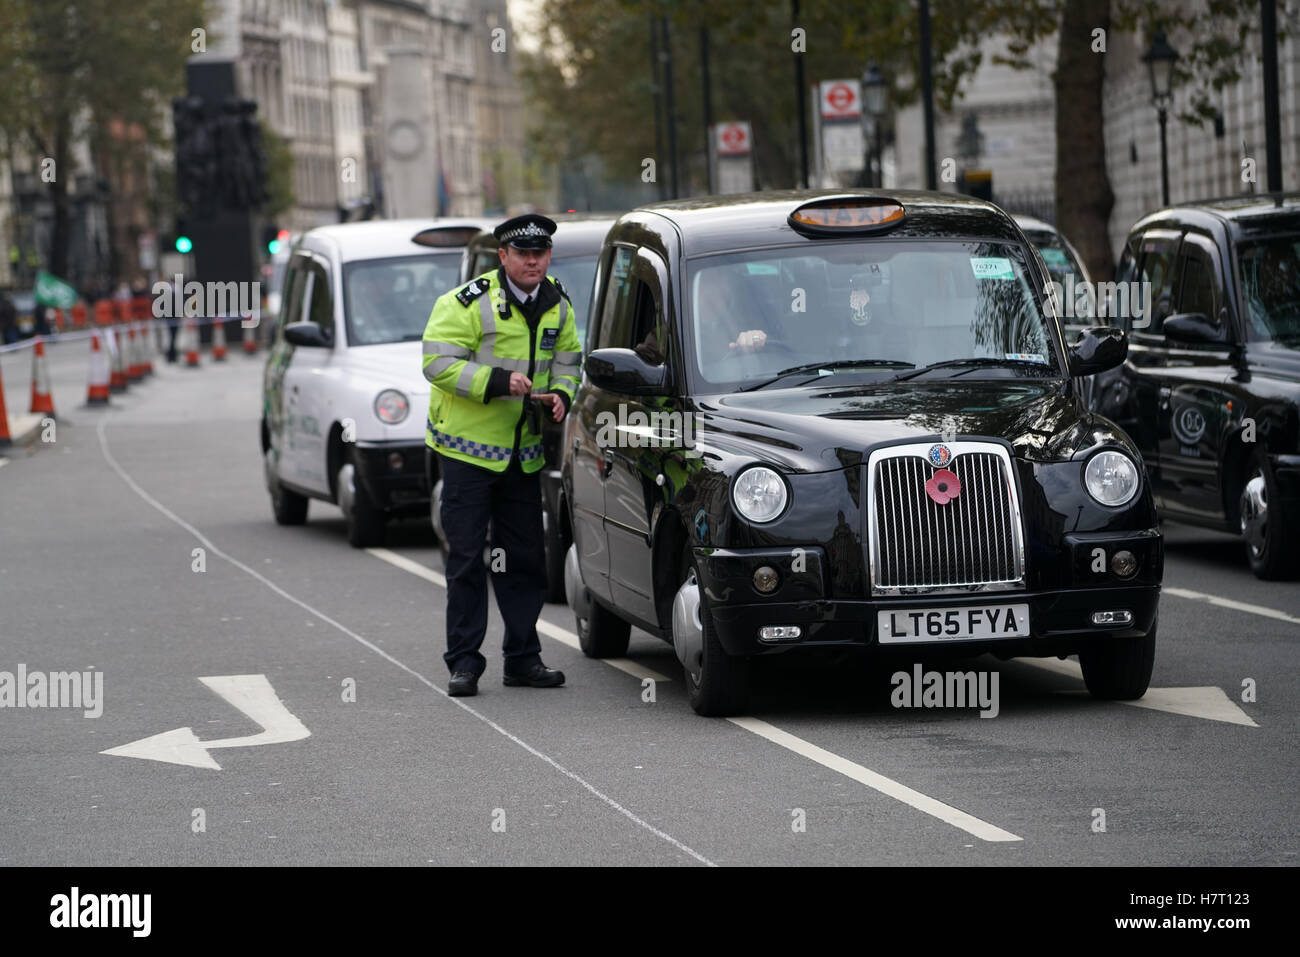 Londres, Inglaterra, Reino Unido. 8 nov, 2016. Naciones Cabbies Grupo traer Whitehall hasta detenerse a exigir una Foto de stock